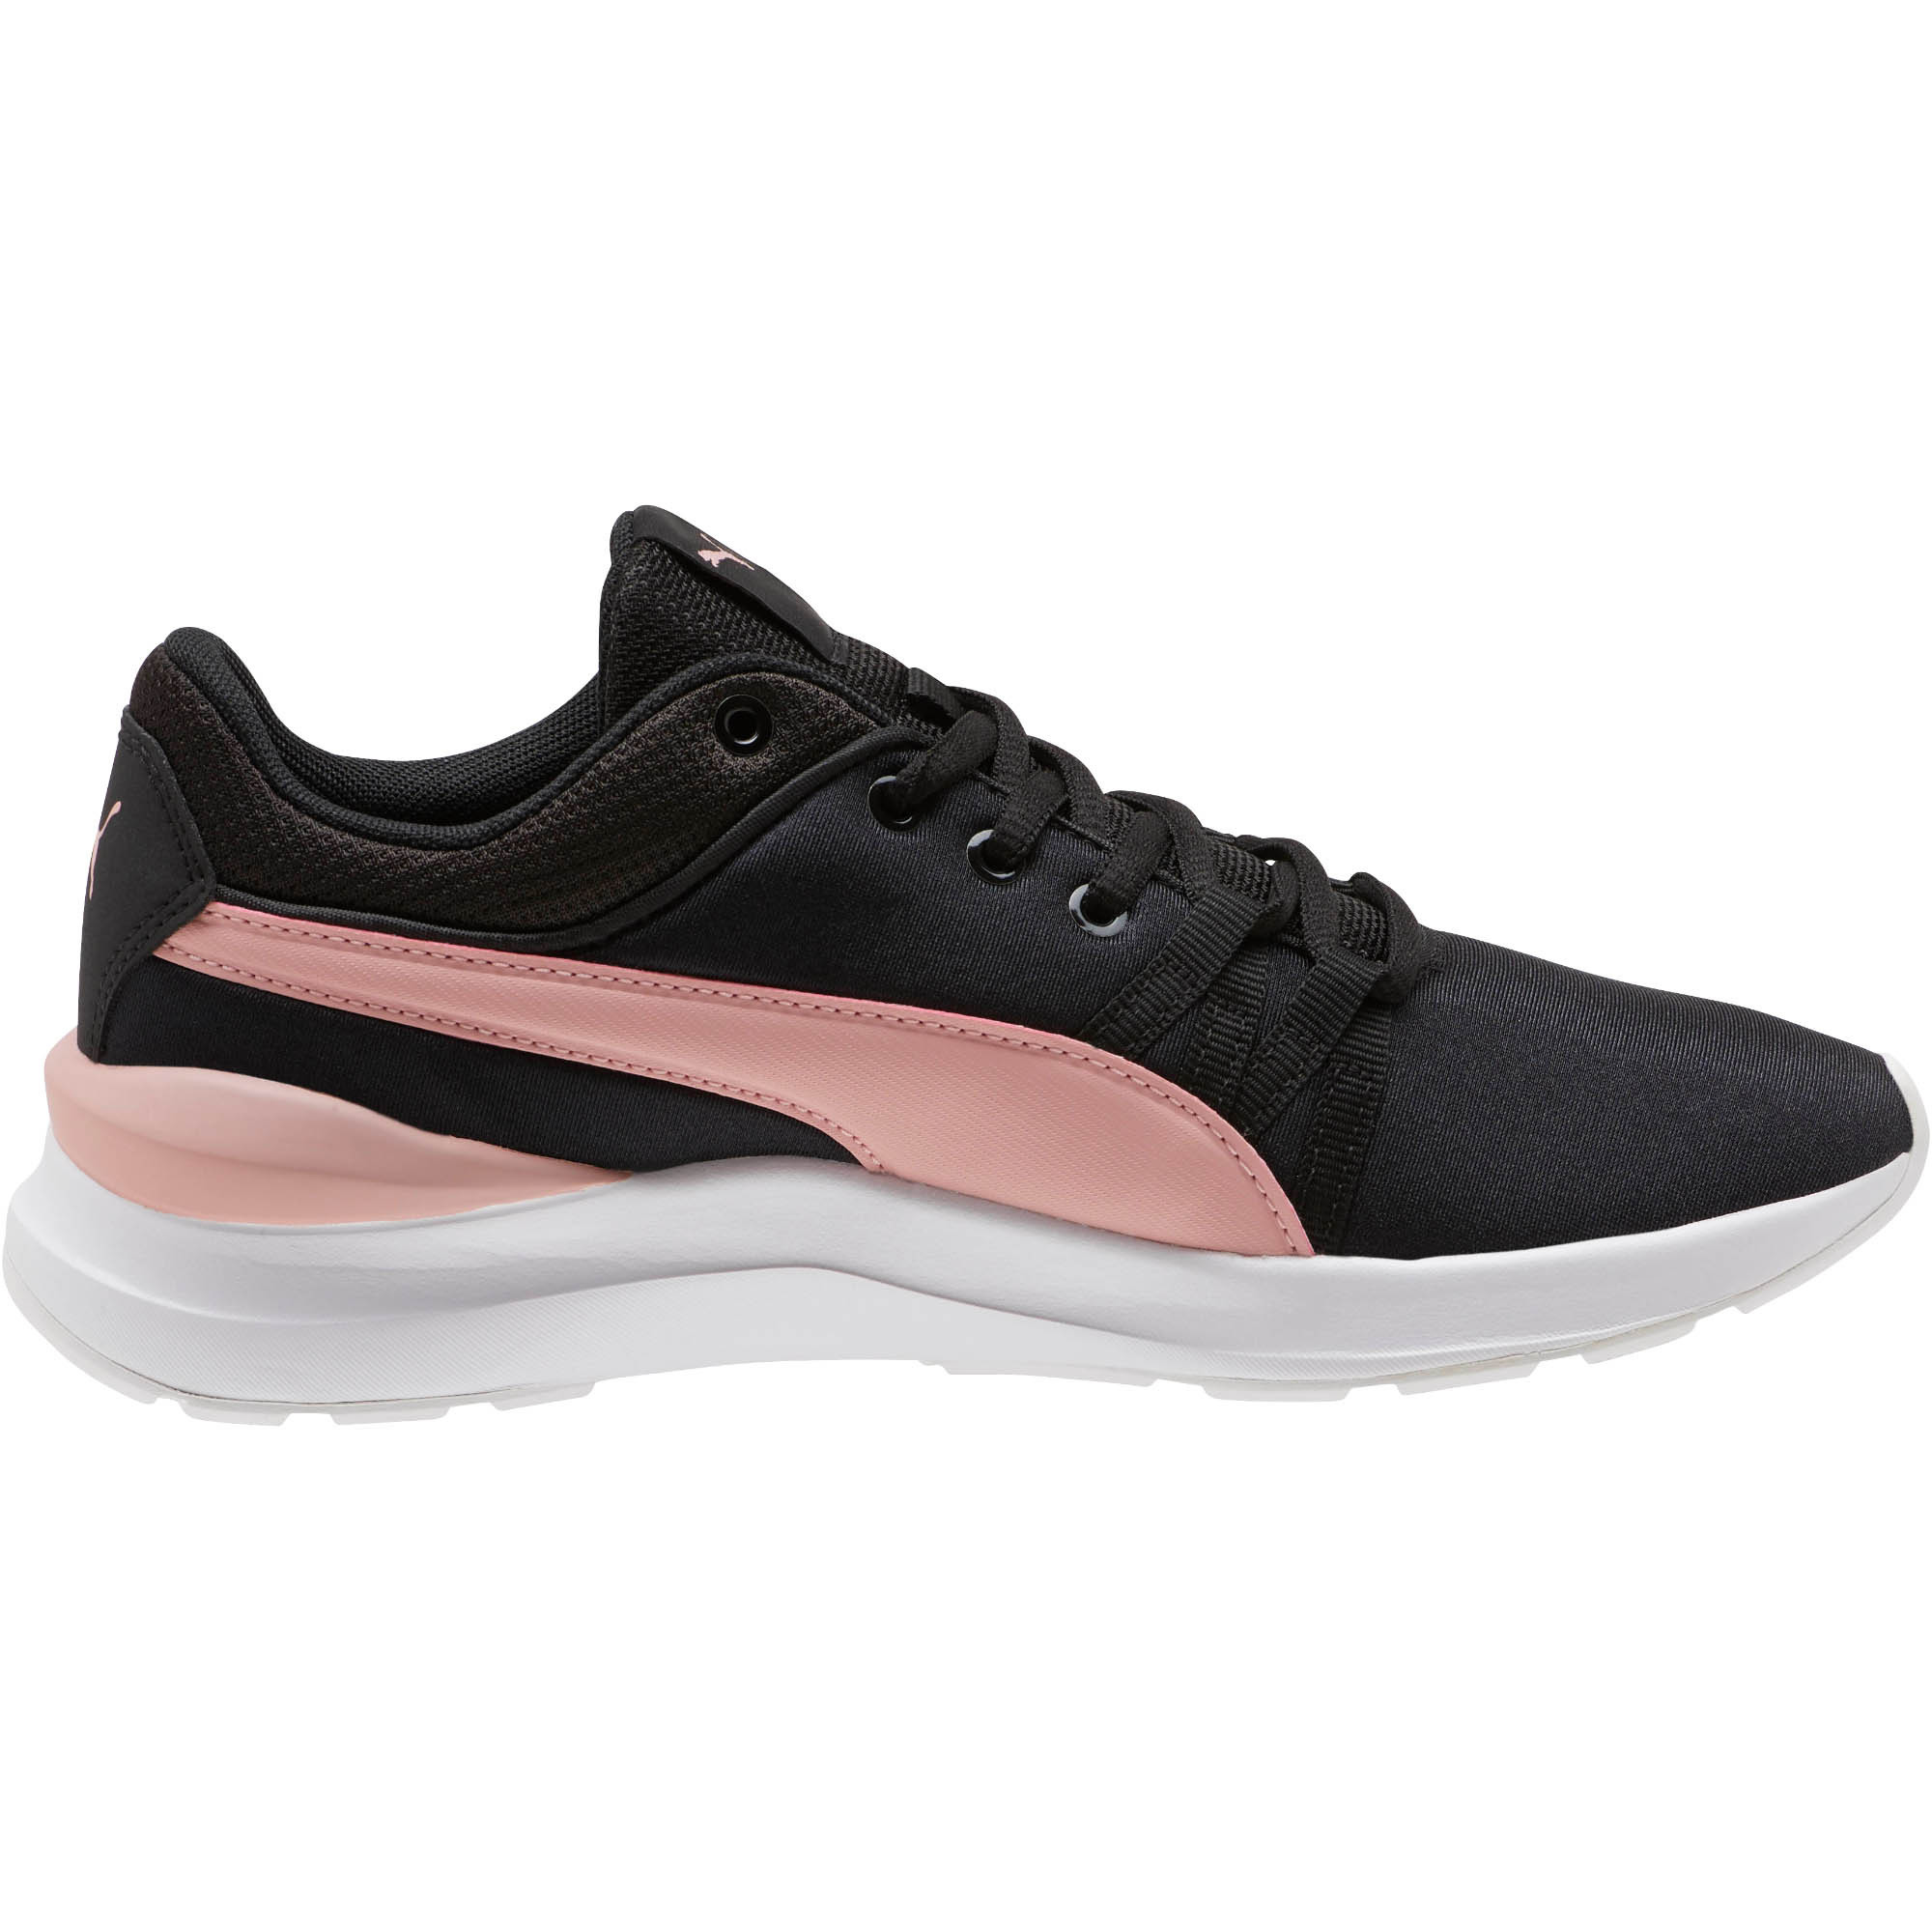 PUMA-Adela-Girl-s-Sneakers-JR-Girls-Shoe-Kids thumbnail 5